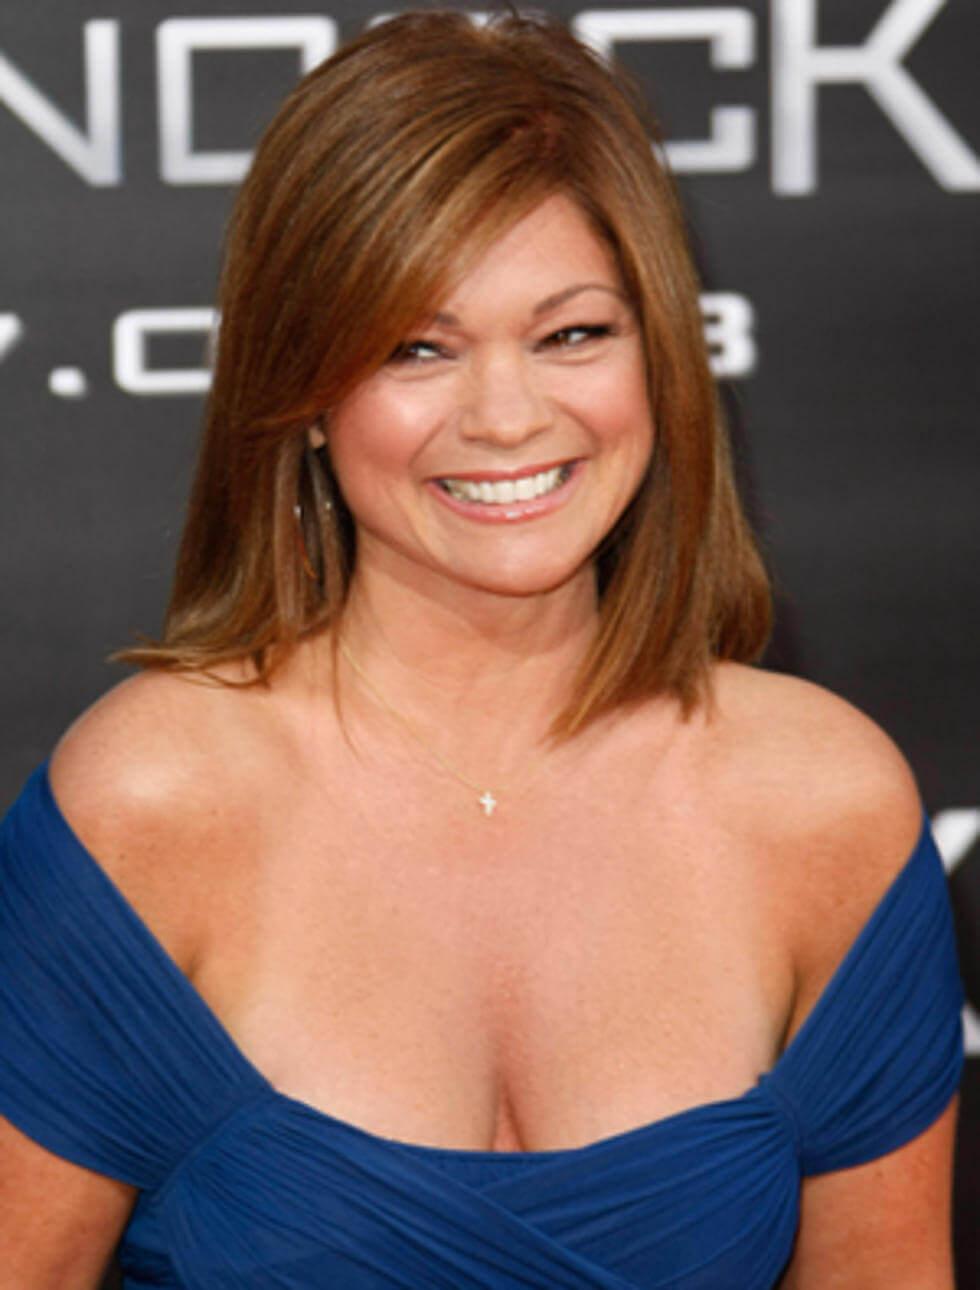 Valerie Bertinelli cleavage pictures